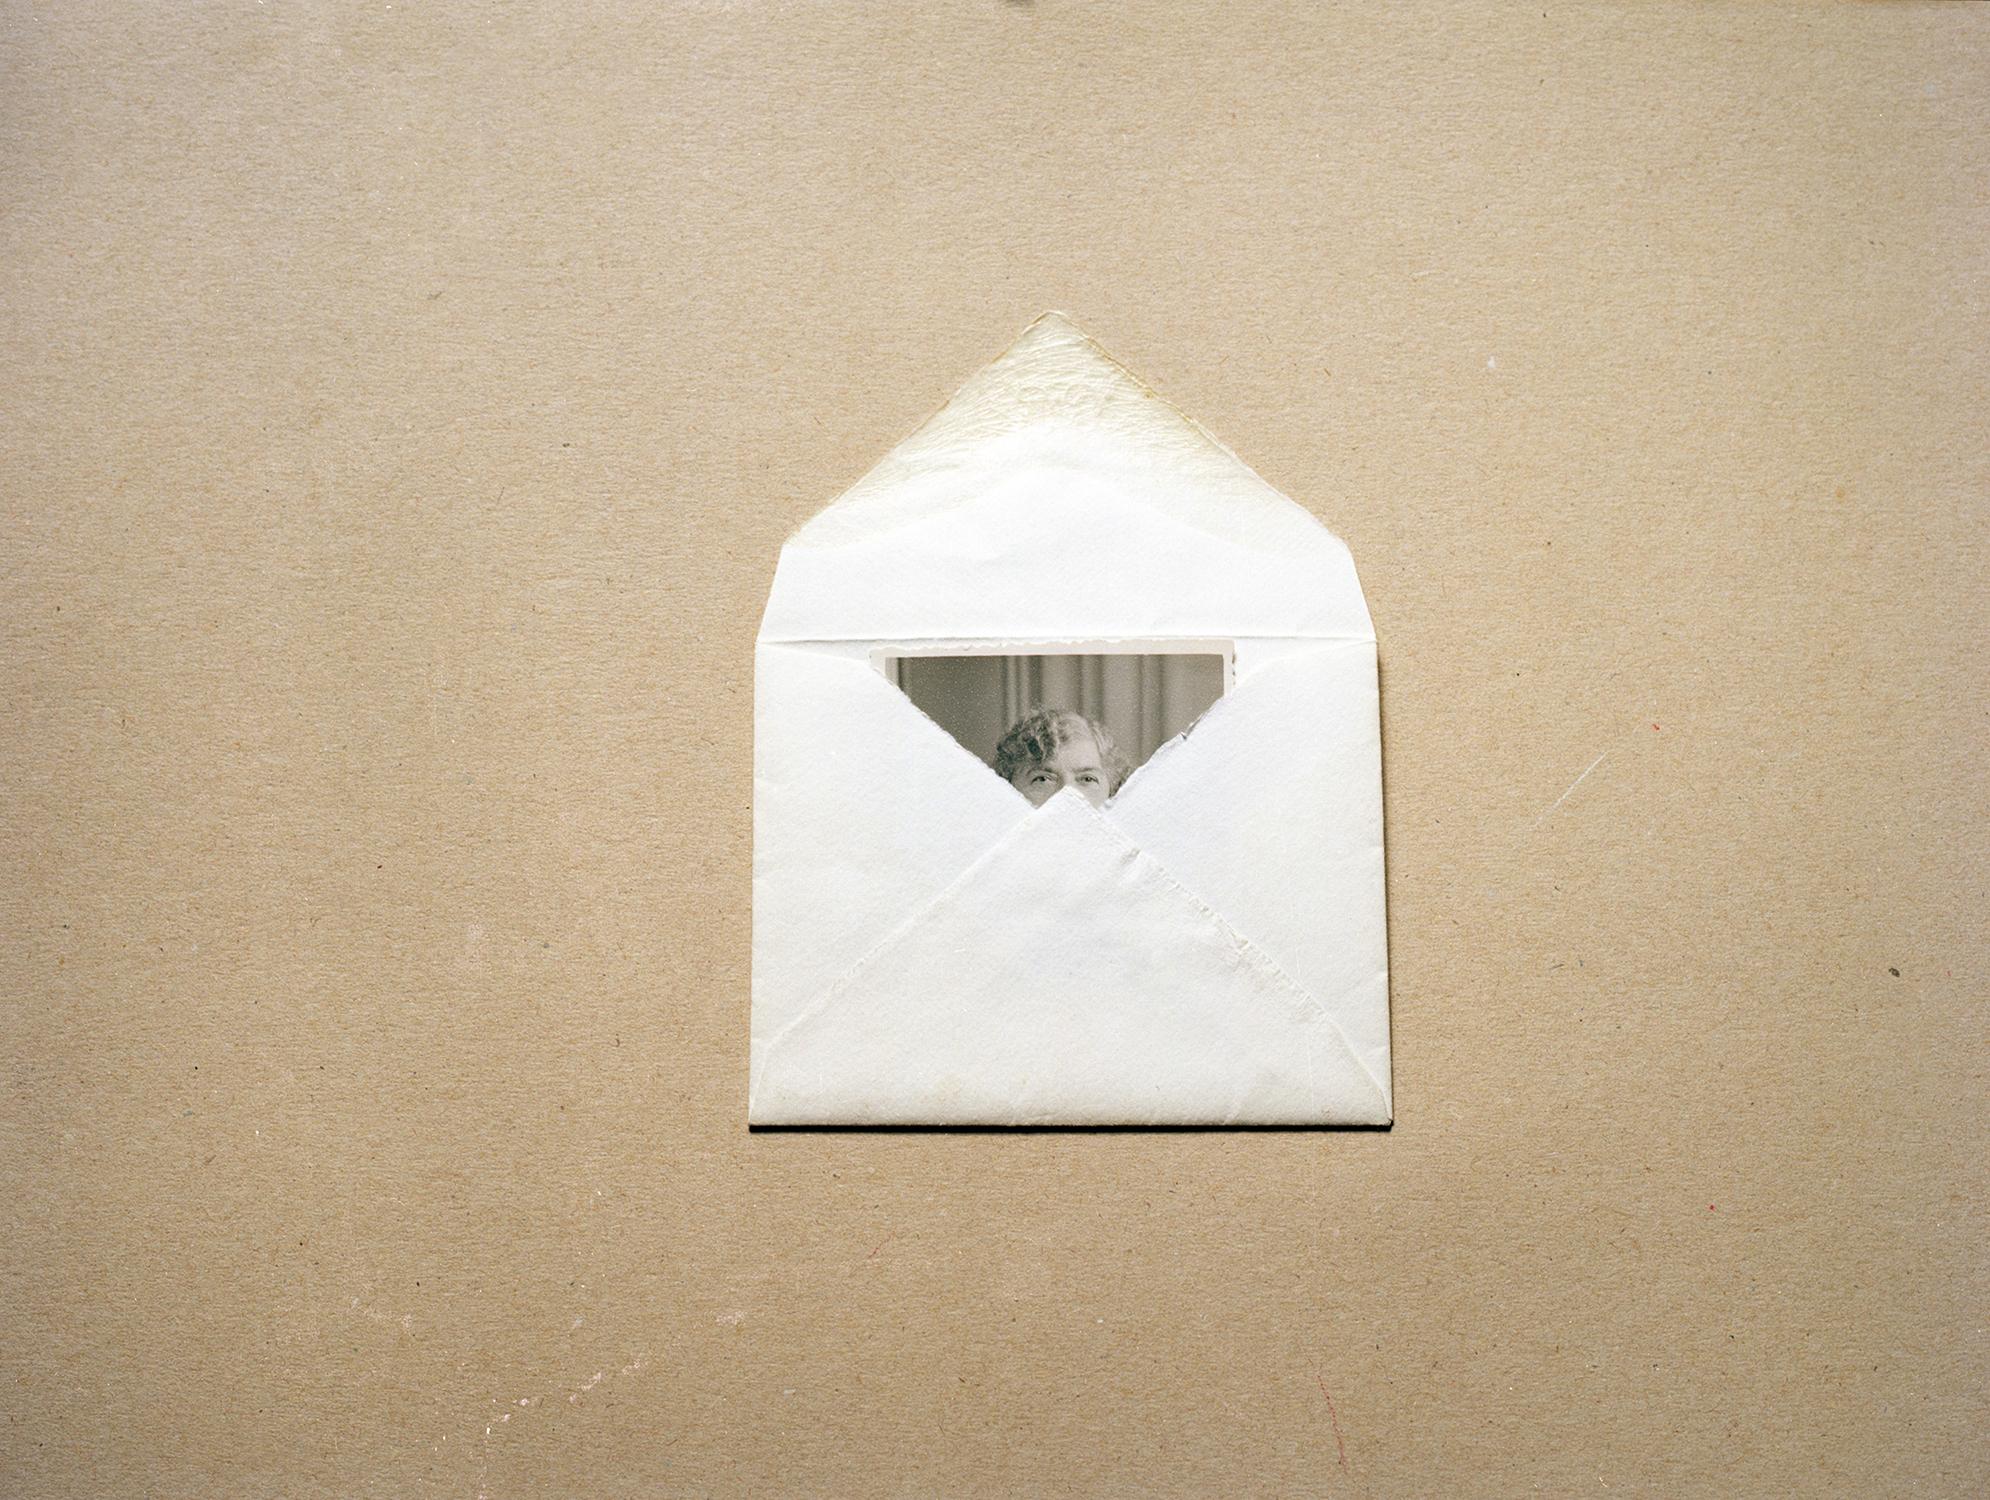 """Lady in Envelope, Israel, 2012"" by Dana Stirling"